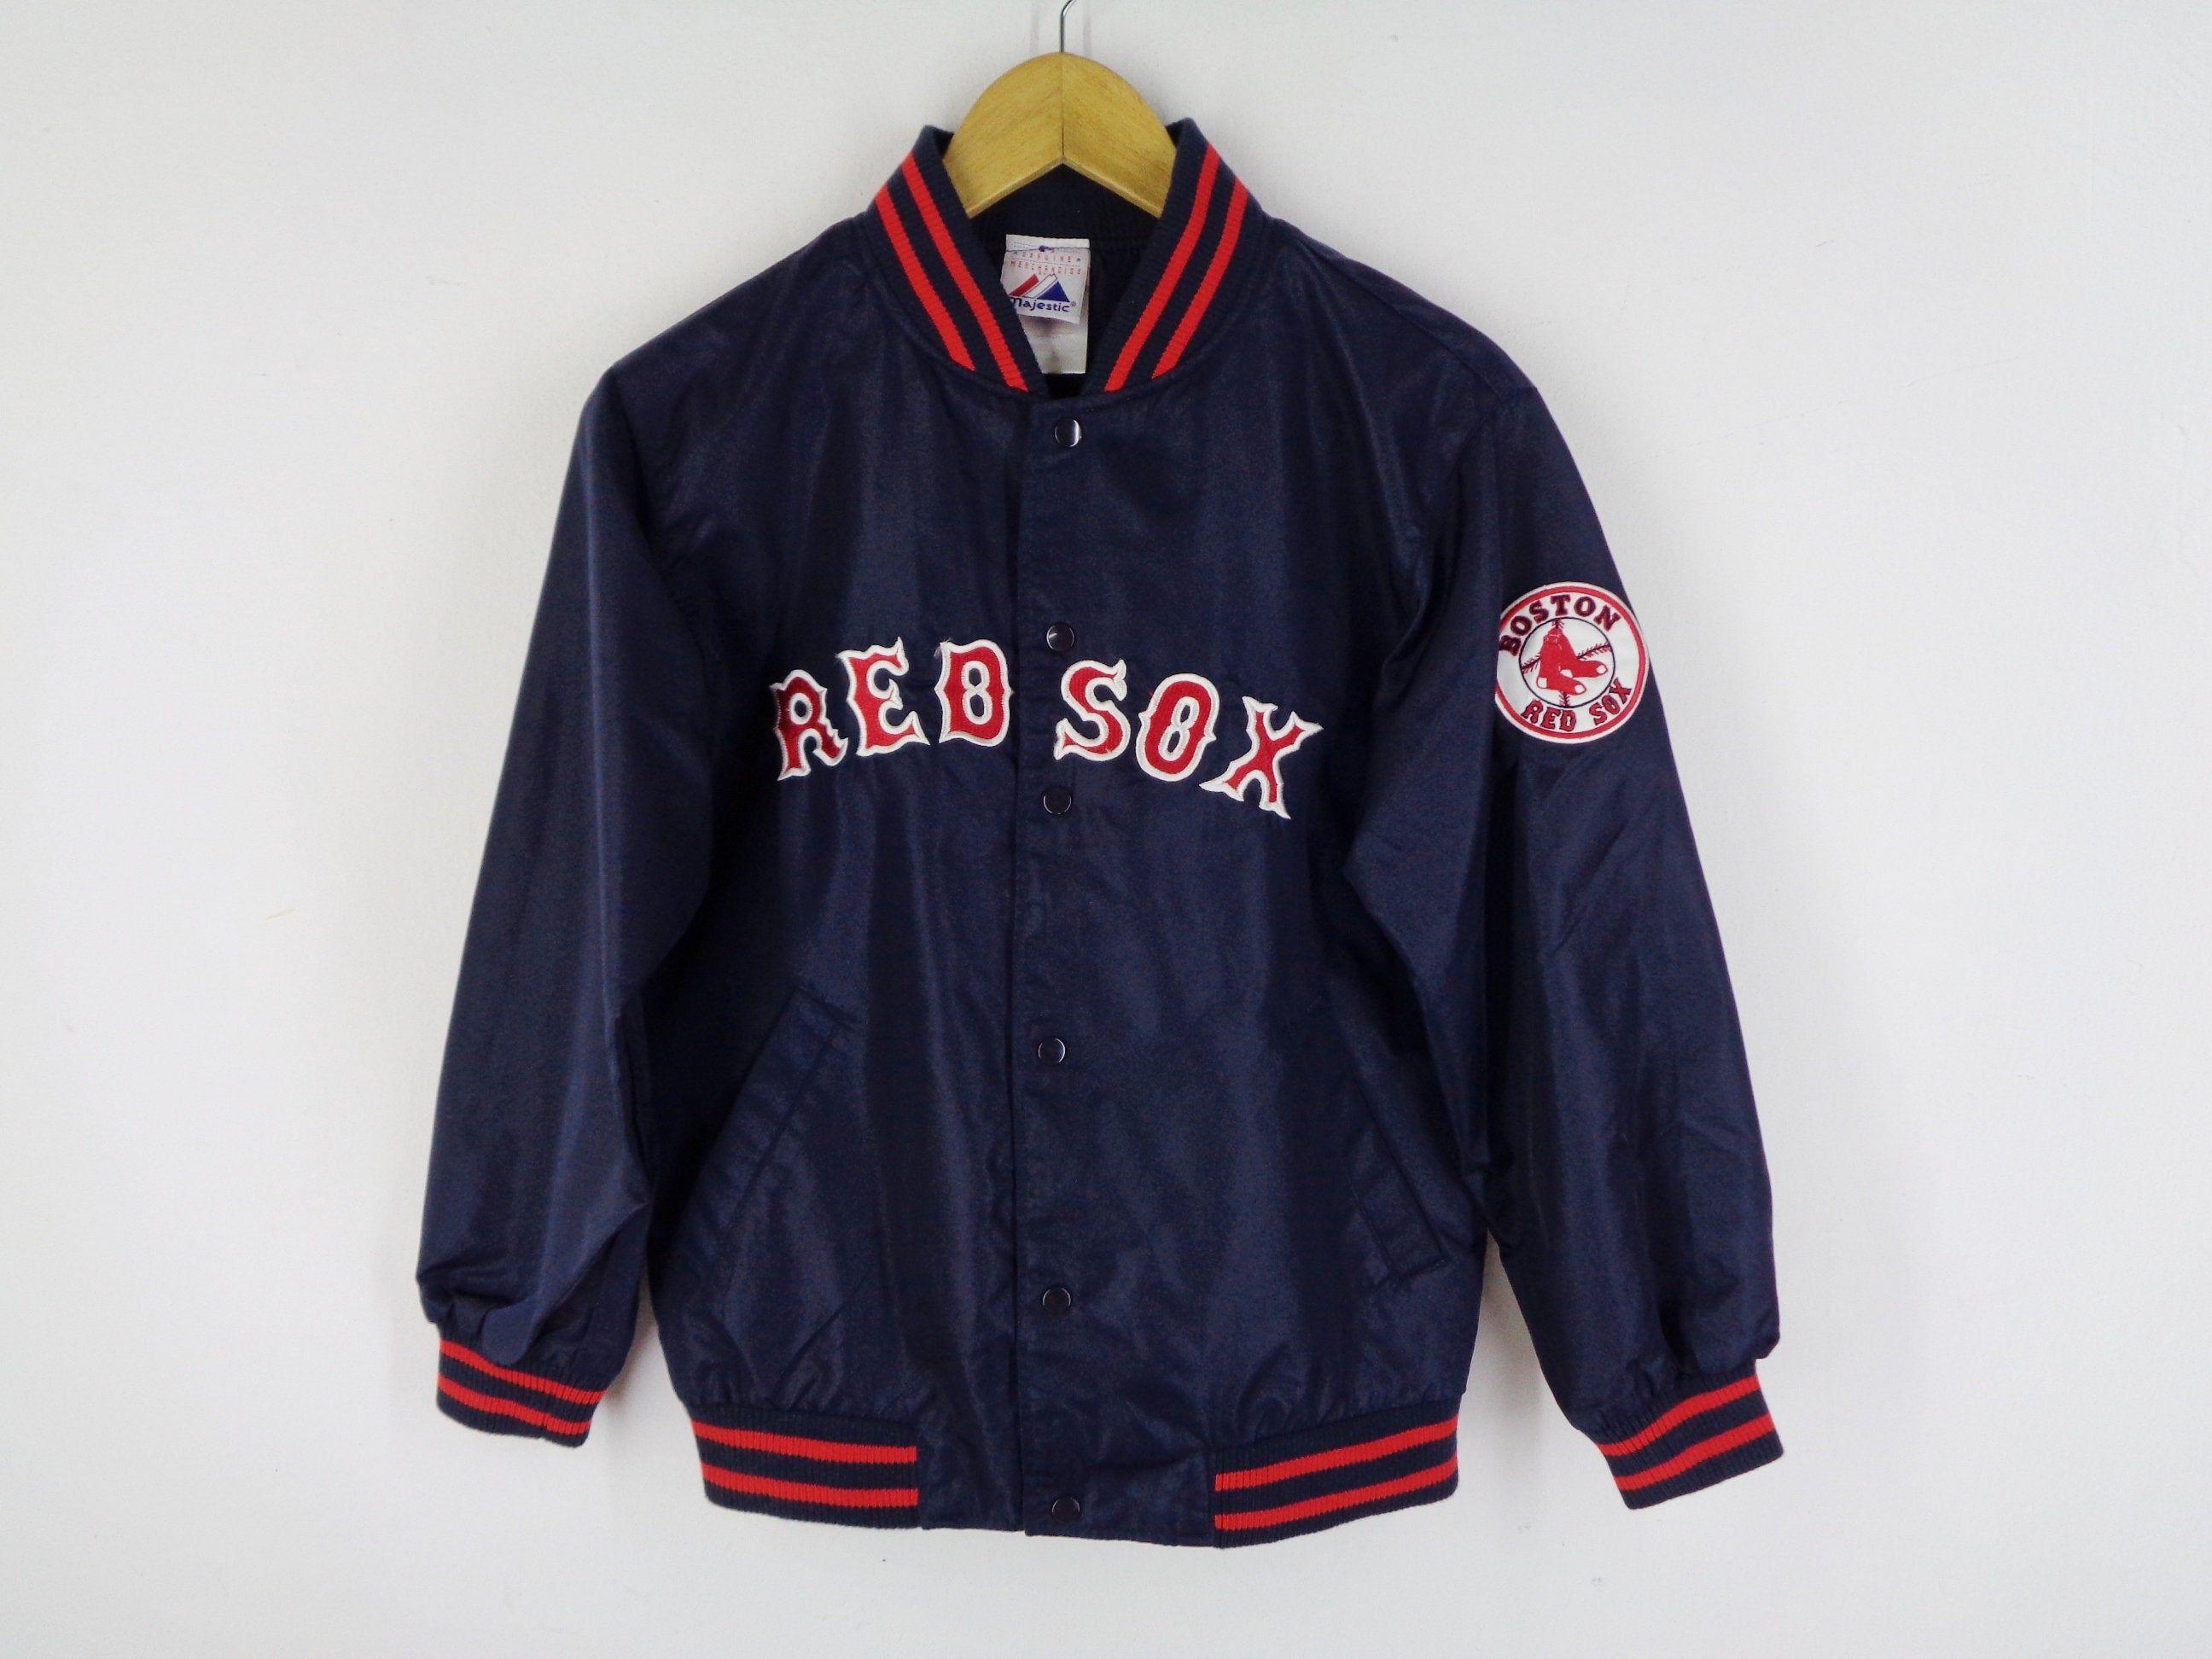 Red Sox Jacket Vintage Boston Red Sox Jacket Vintage Red Sox Etsy Red Sox Jacket Windbreaker Jacket Kids Jackets